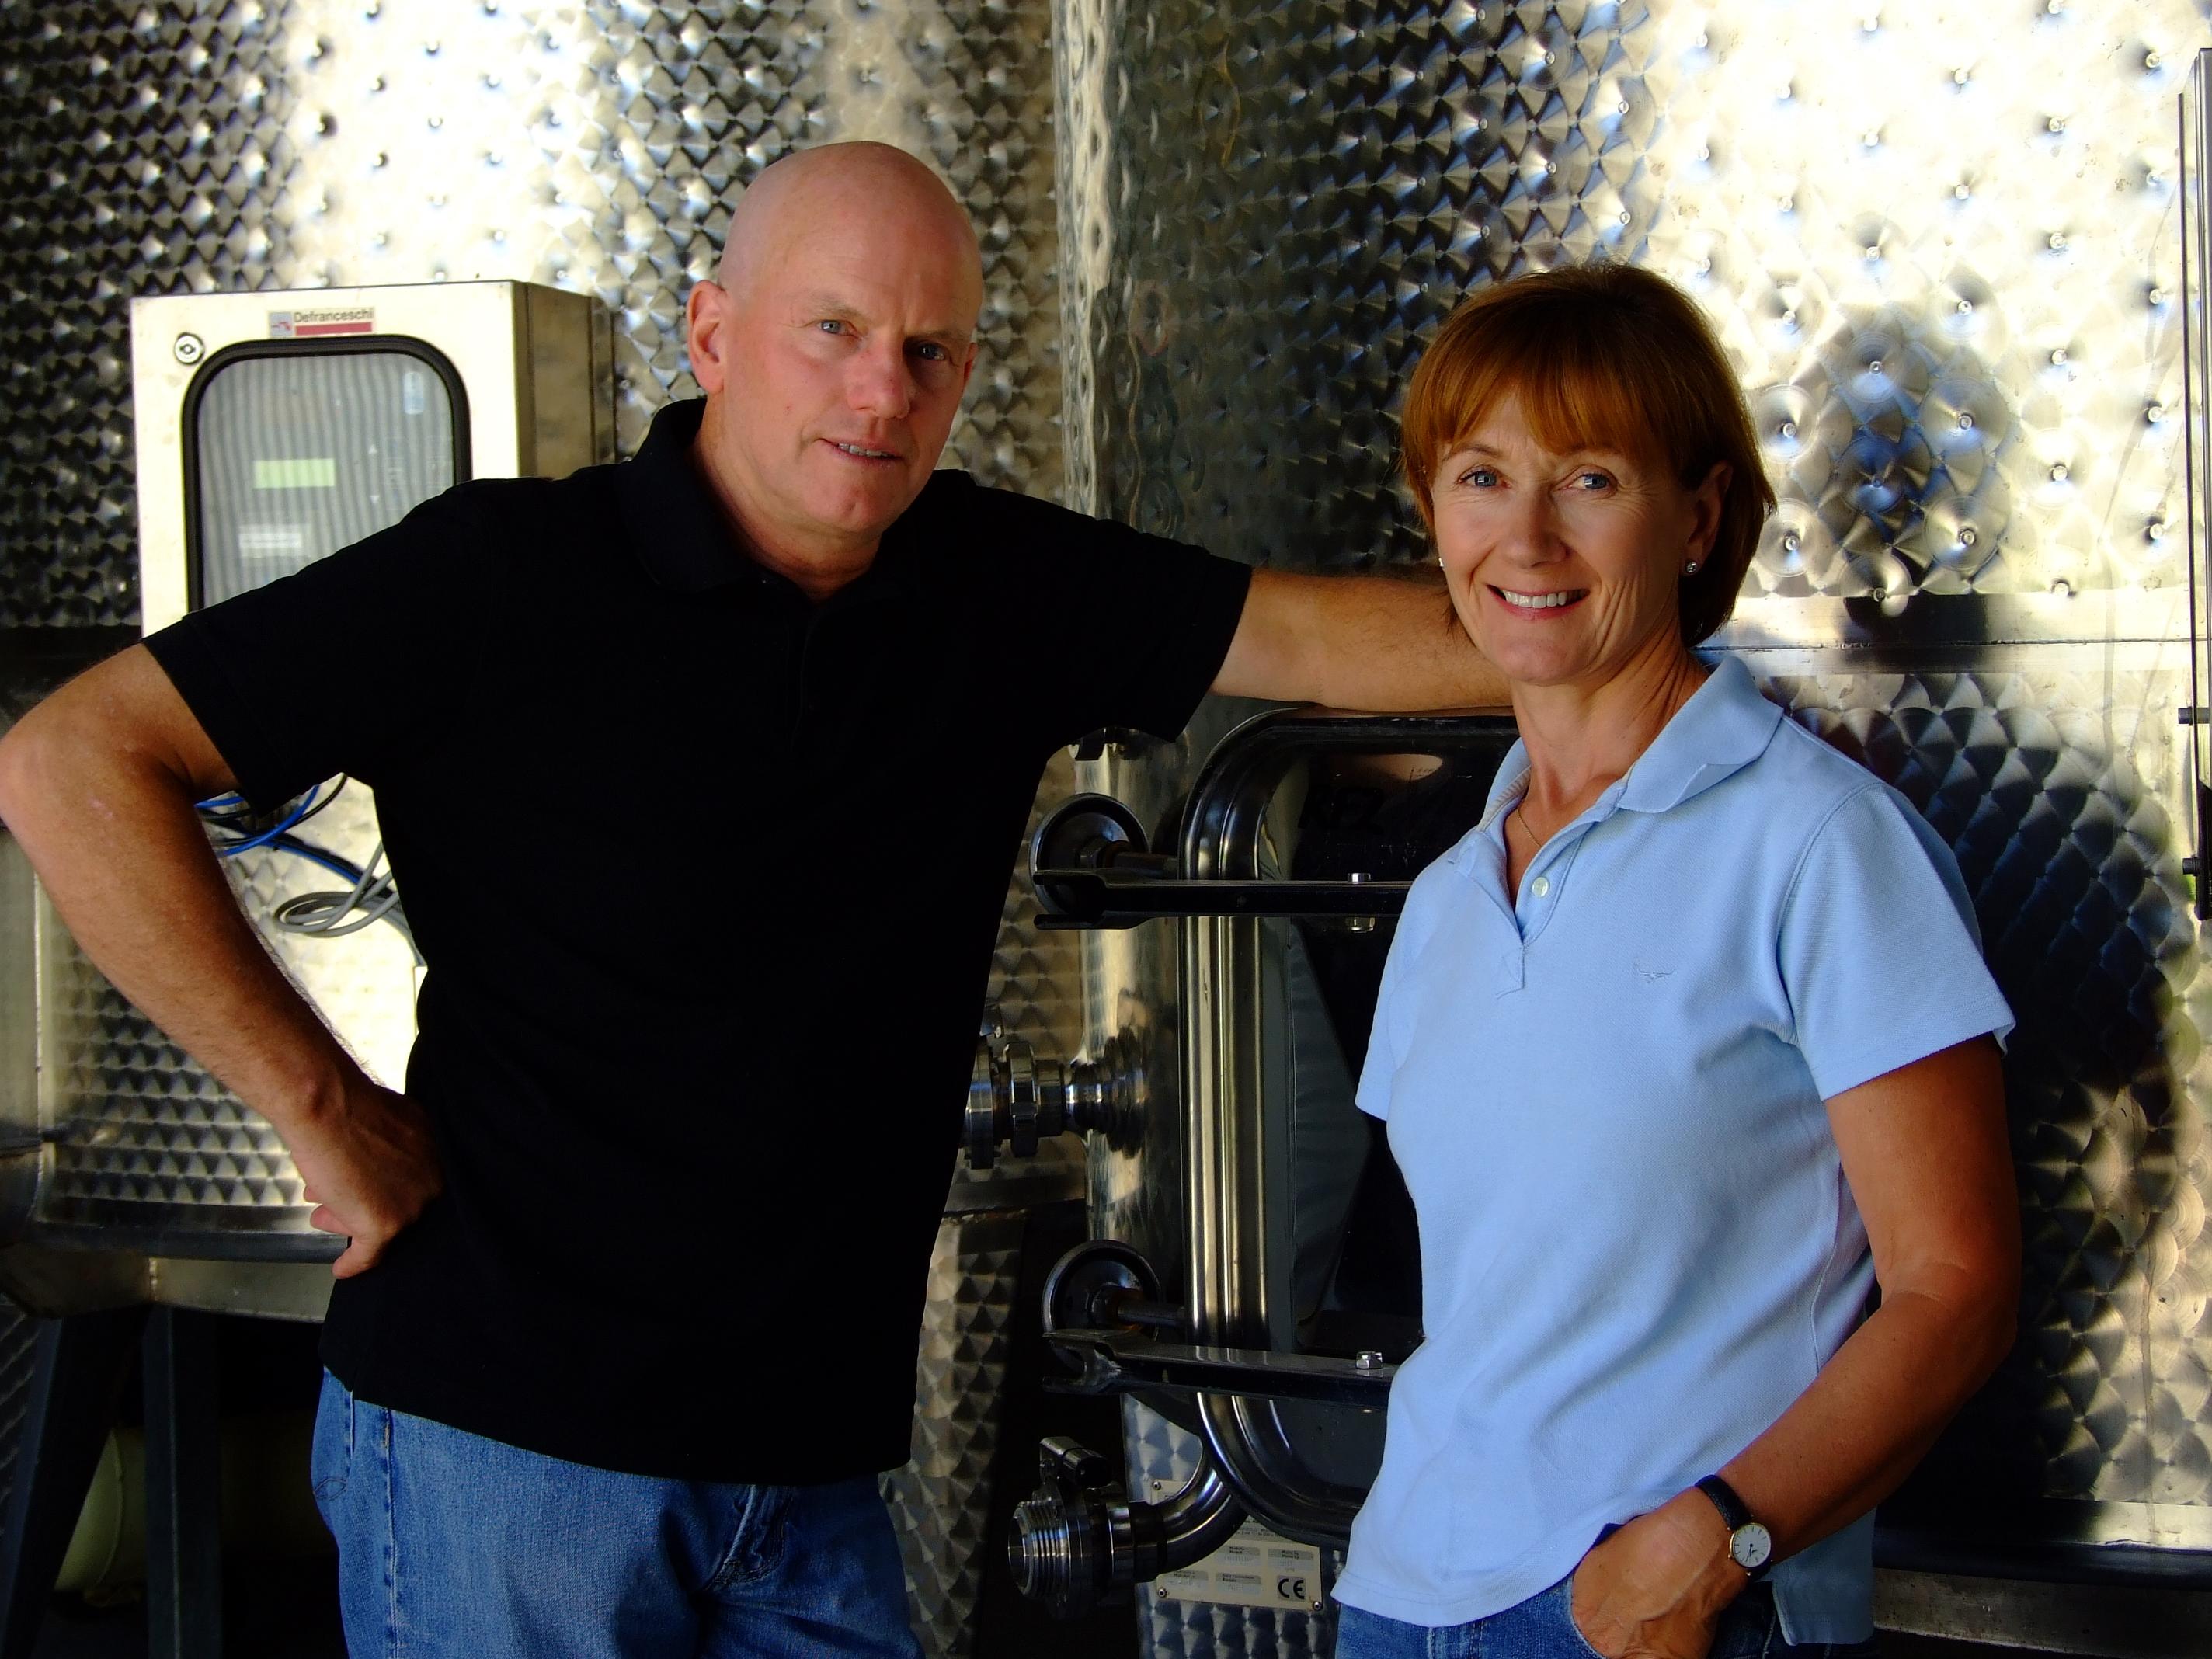 Jeffrey Grosset & Stephanie Toole of Clare Valley, Australia. FWT Magazine.